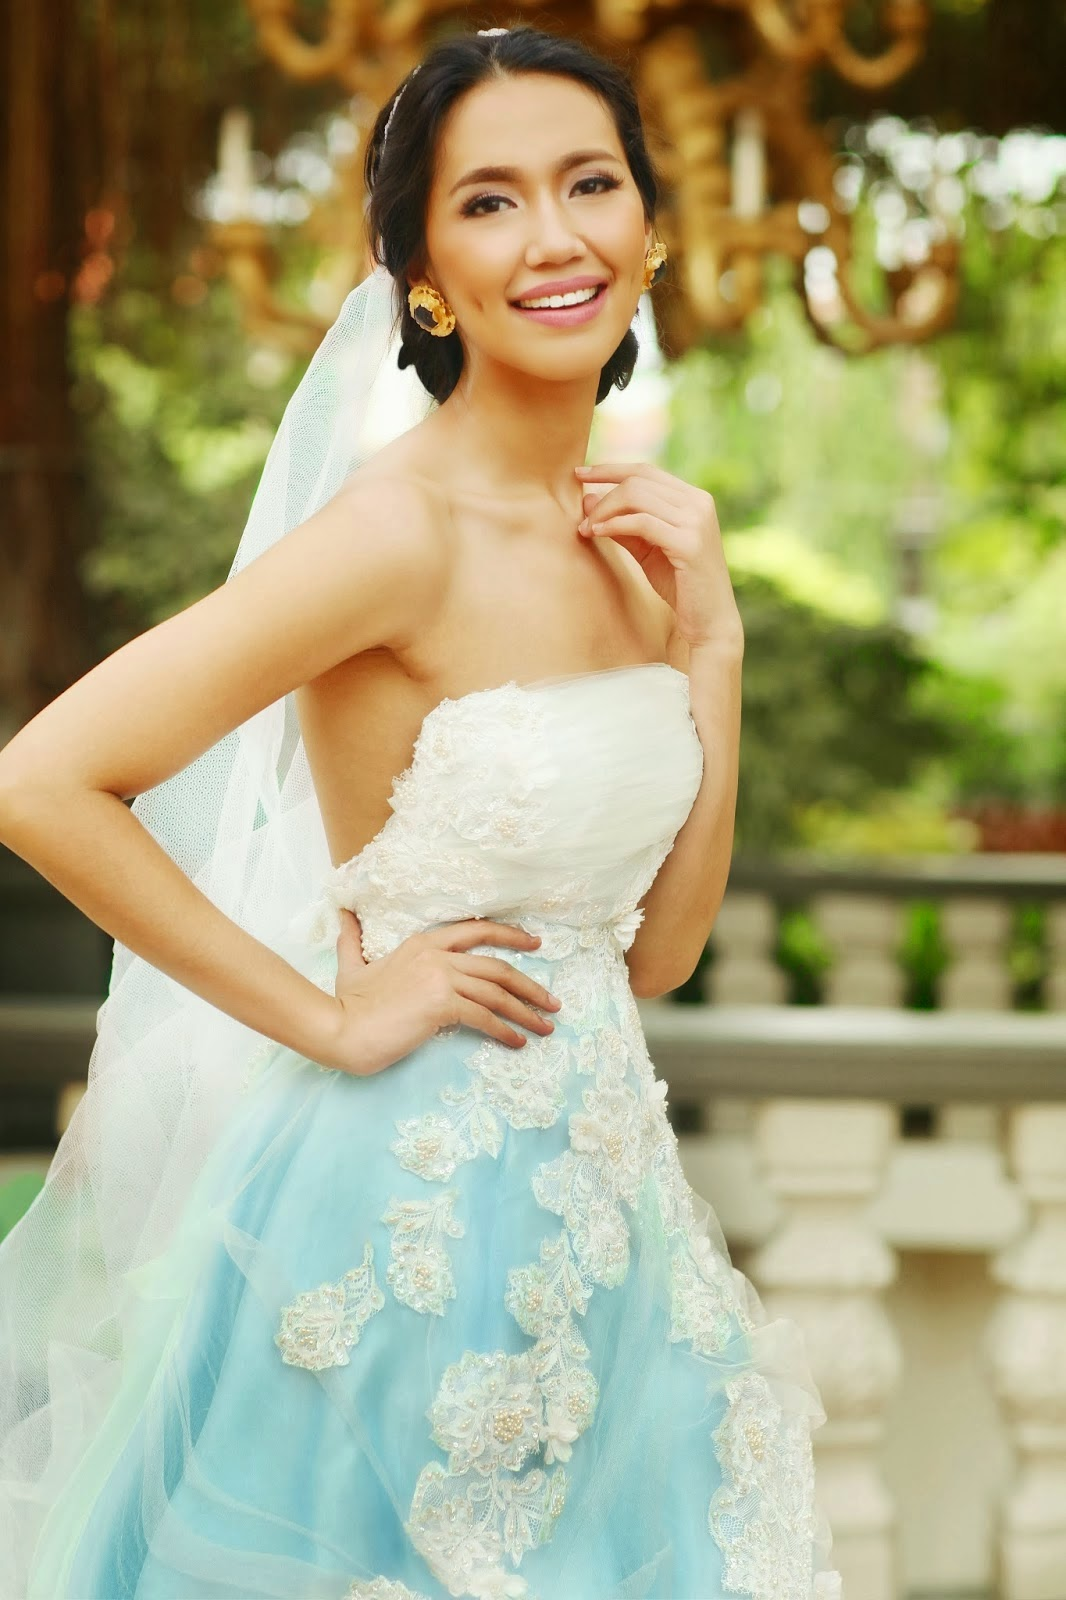 http://hannapechon.blogspot.com/2013/12/blushing-bride.html